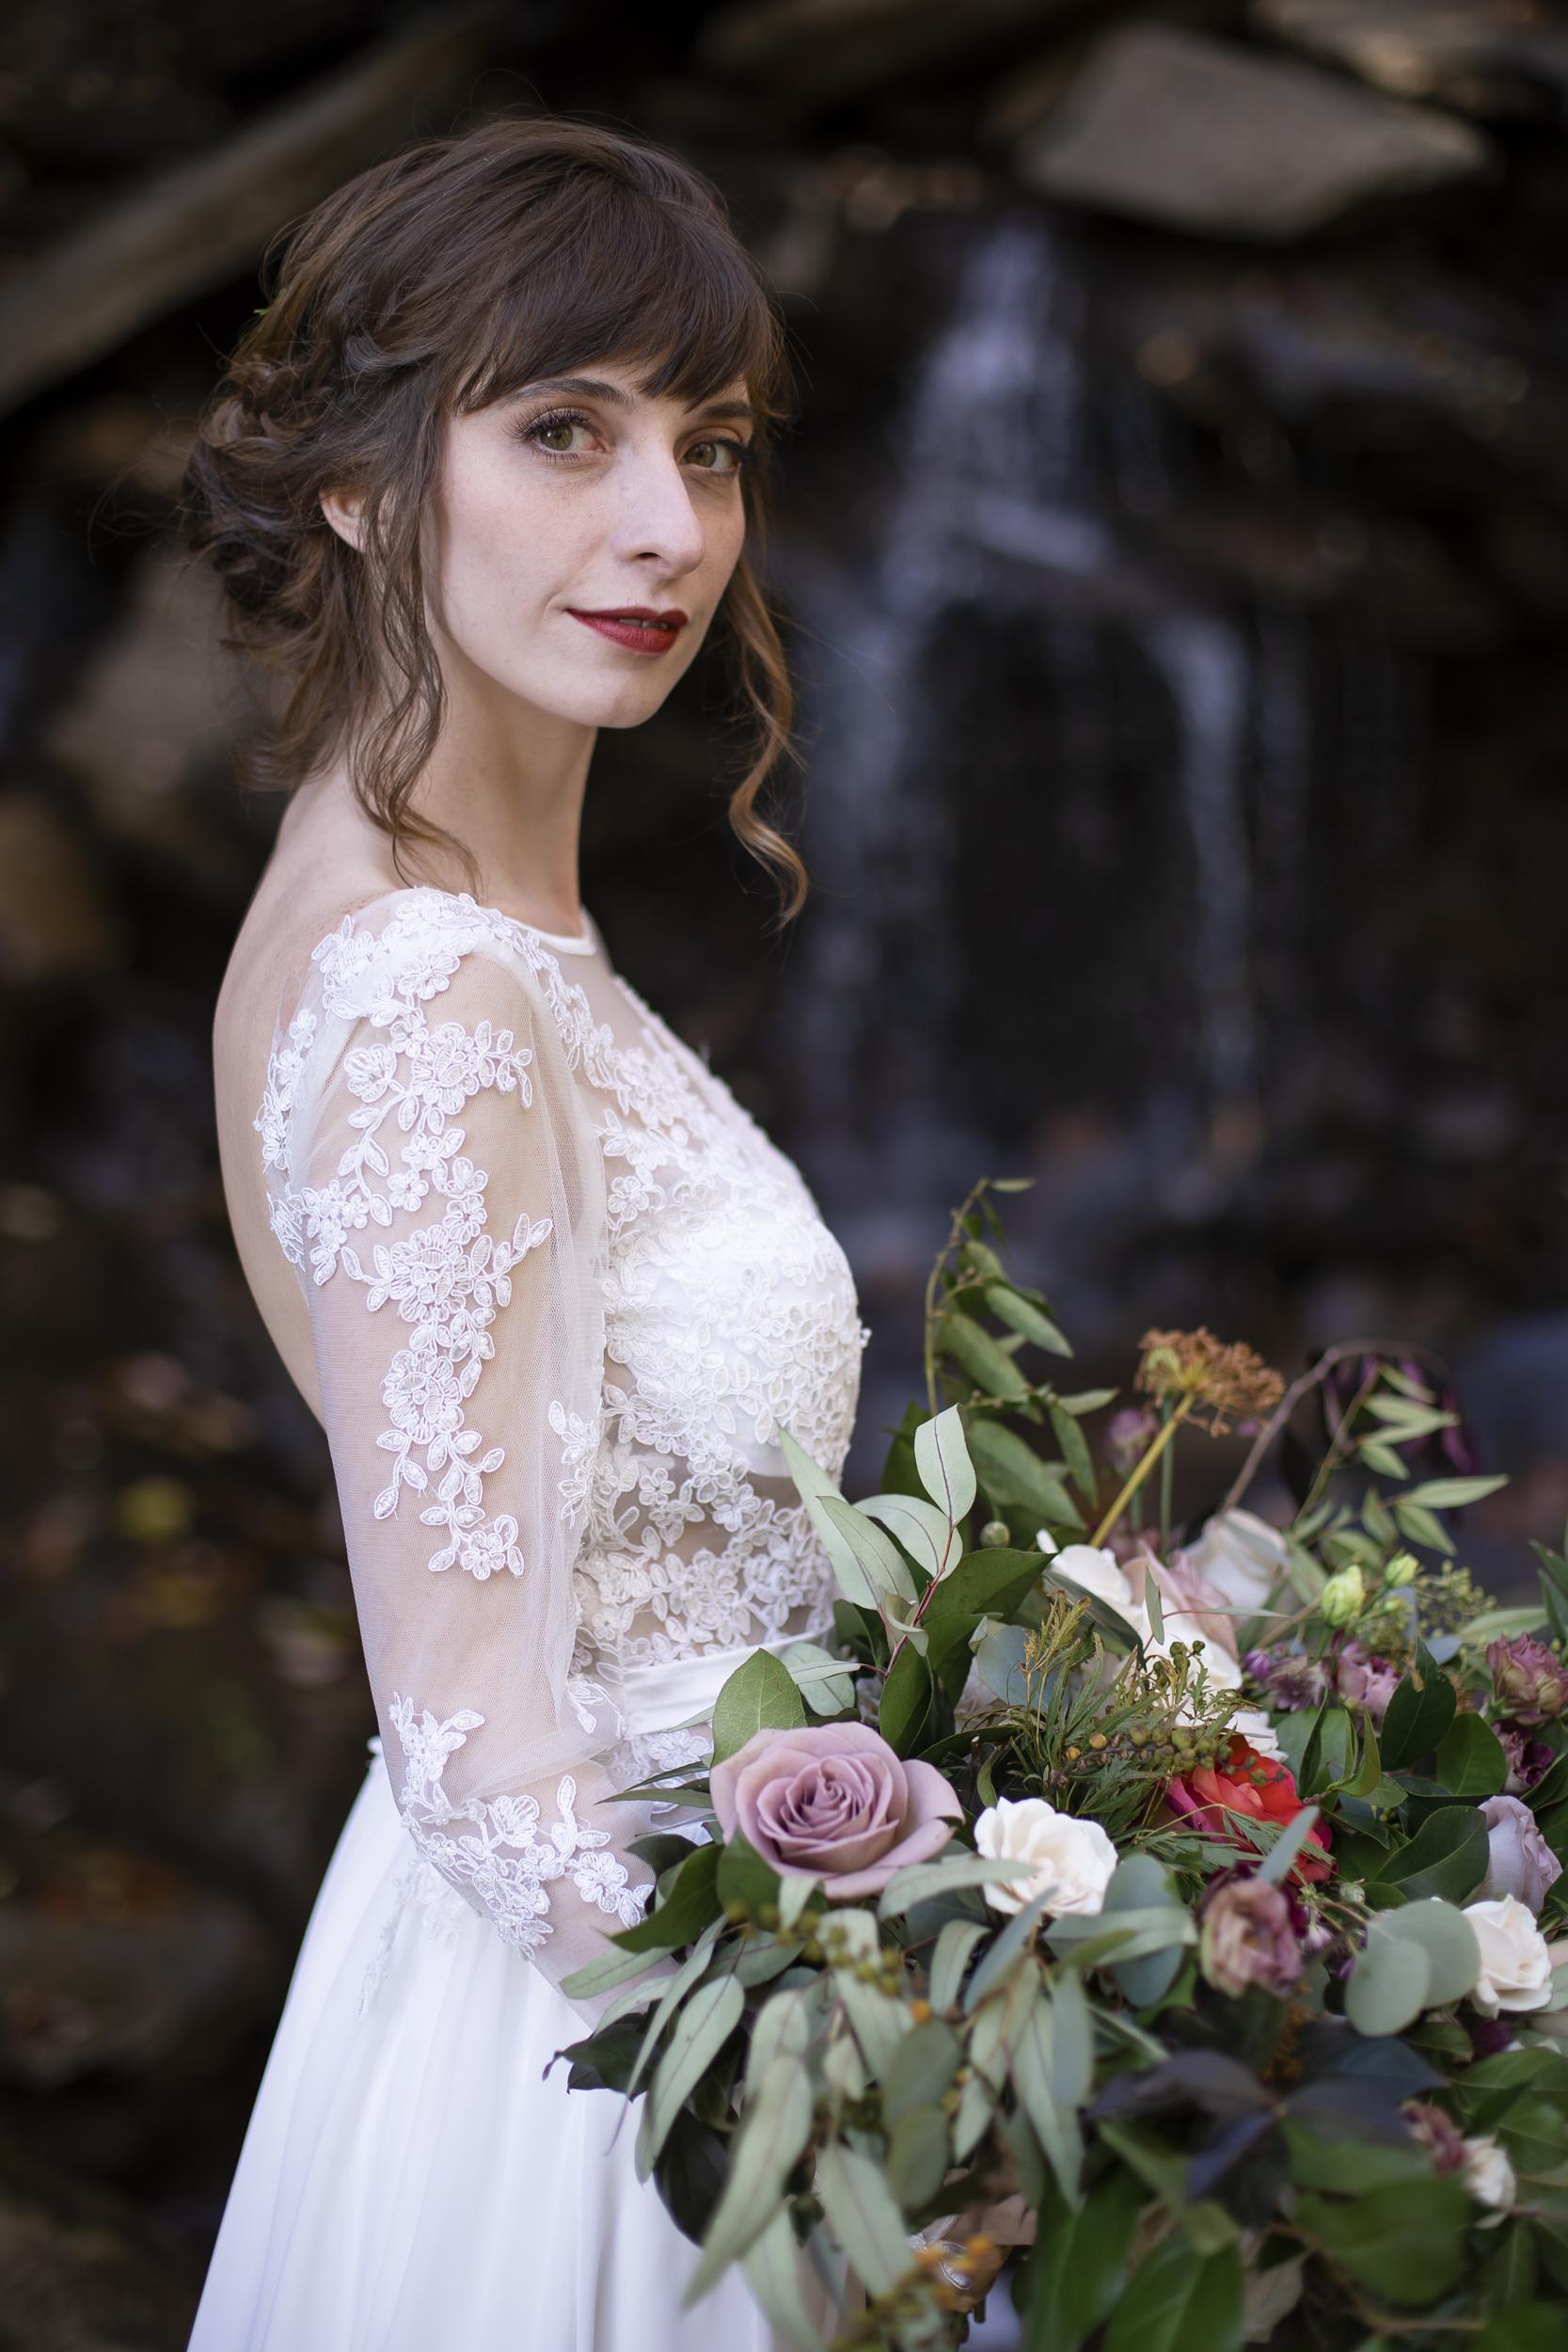 Laurel Falls Wedding October 2018_Allison and Josh__Lola Salon_Flora_Photo by Studio Misha Photography-101.jpg